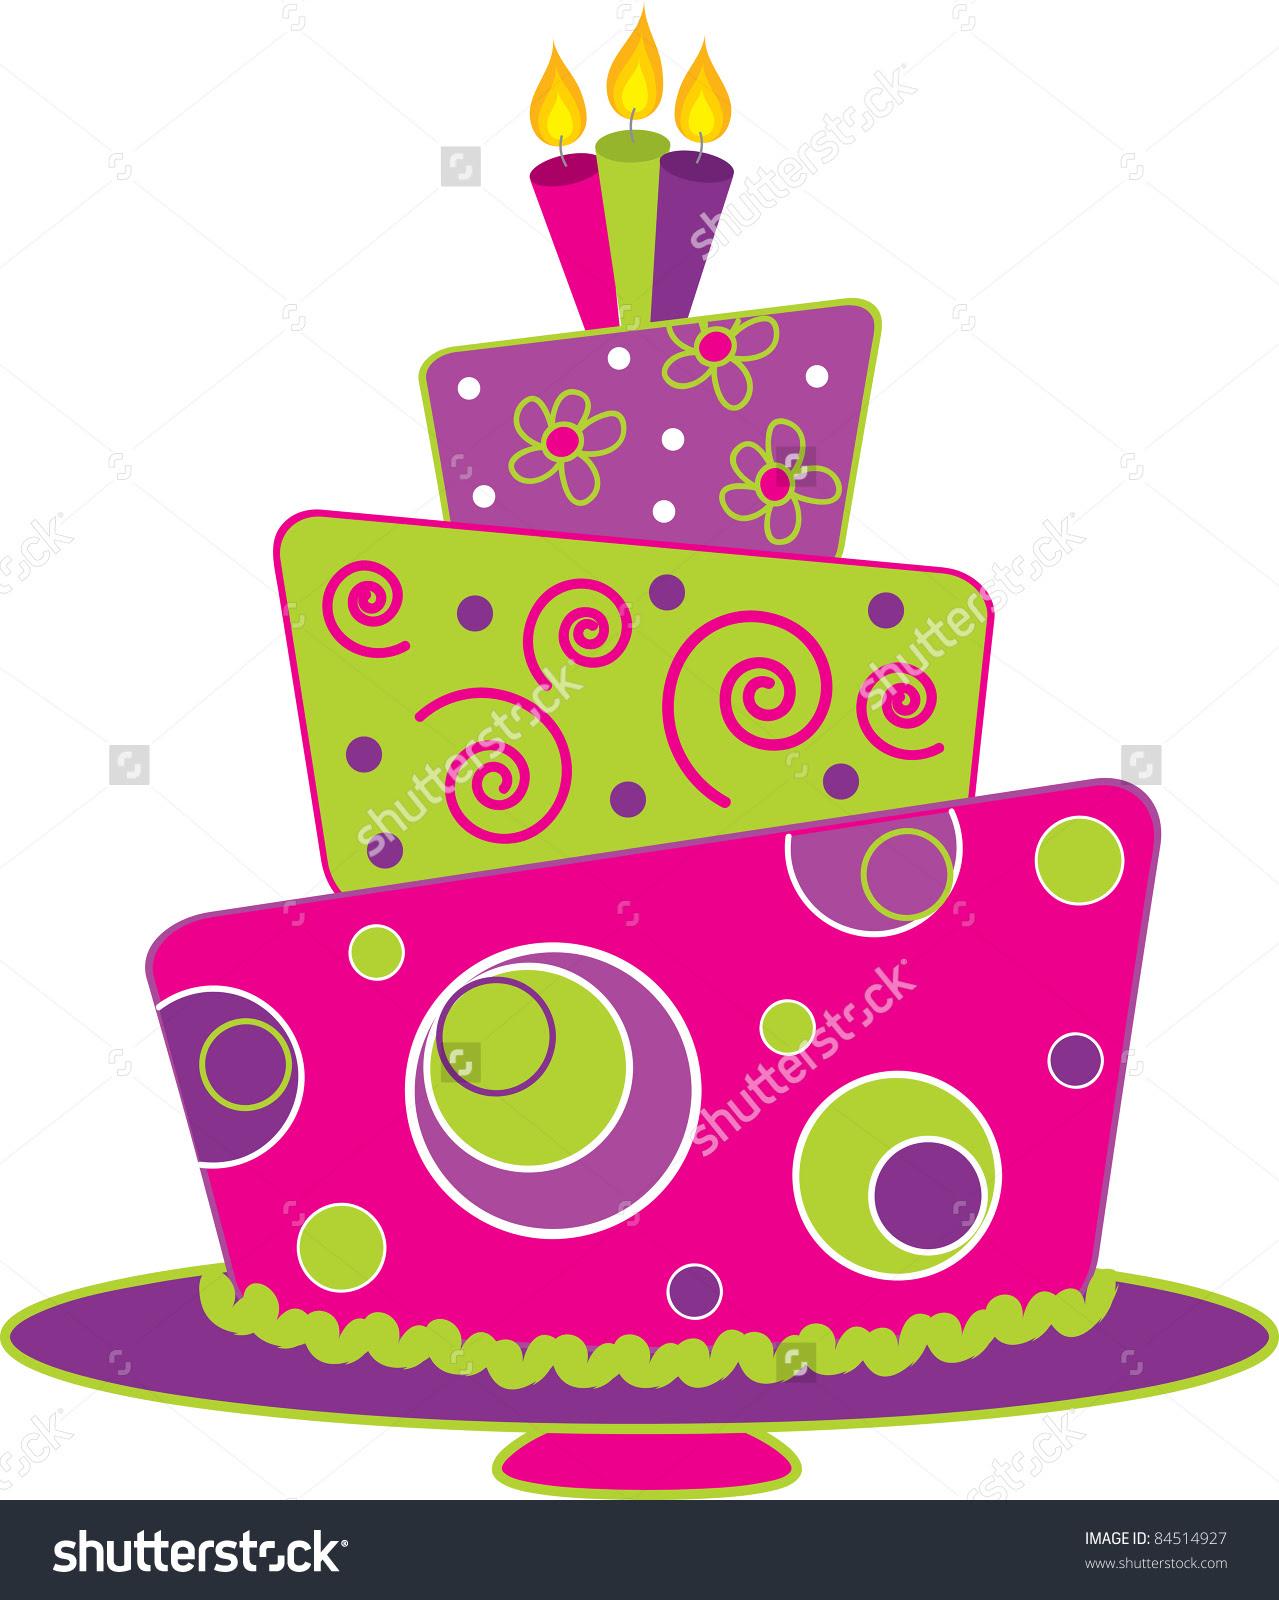 Cake Illustrations Royaltyfree Vector Graphics  Clip Art